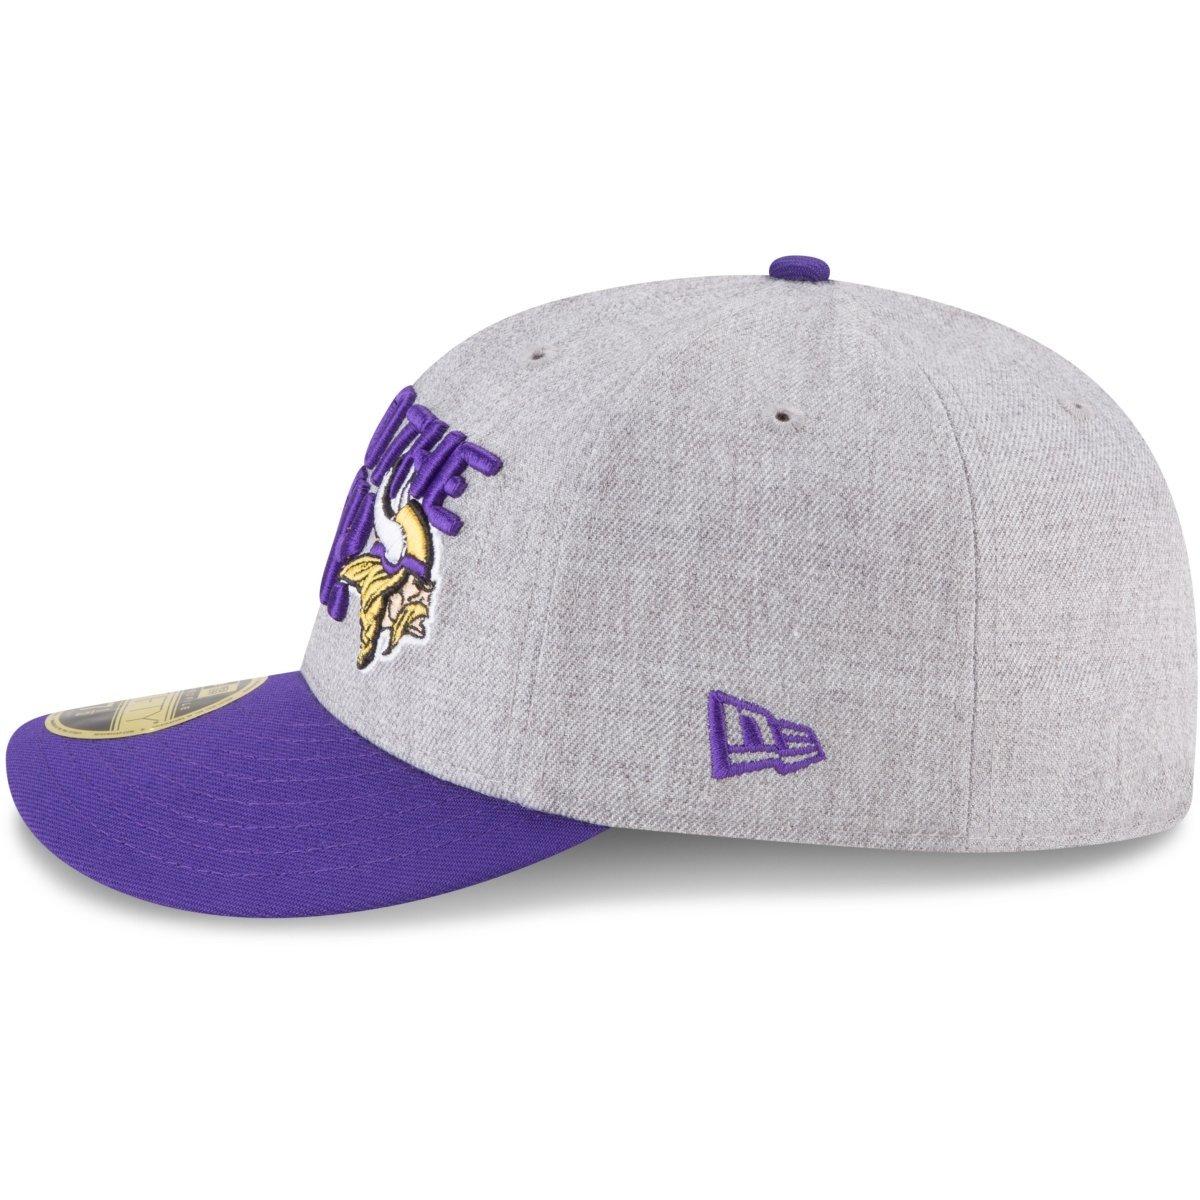 New Era 59Fifty Low Profile Cap Draft Minnesota Vikings